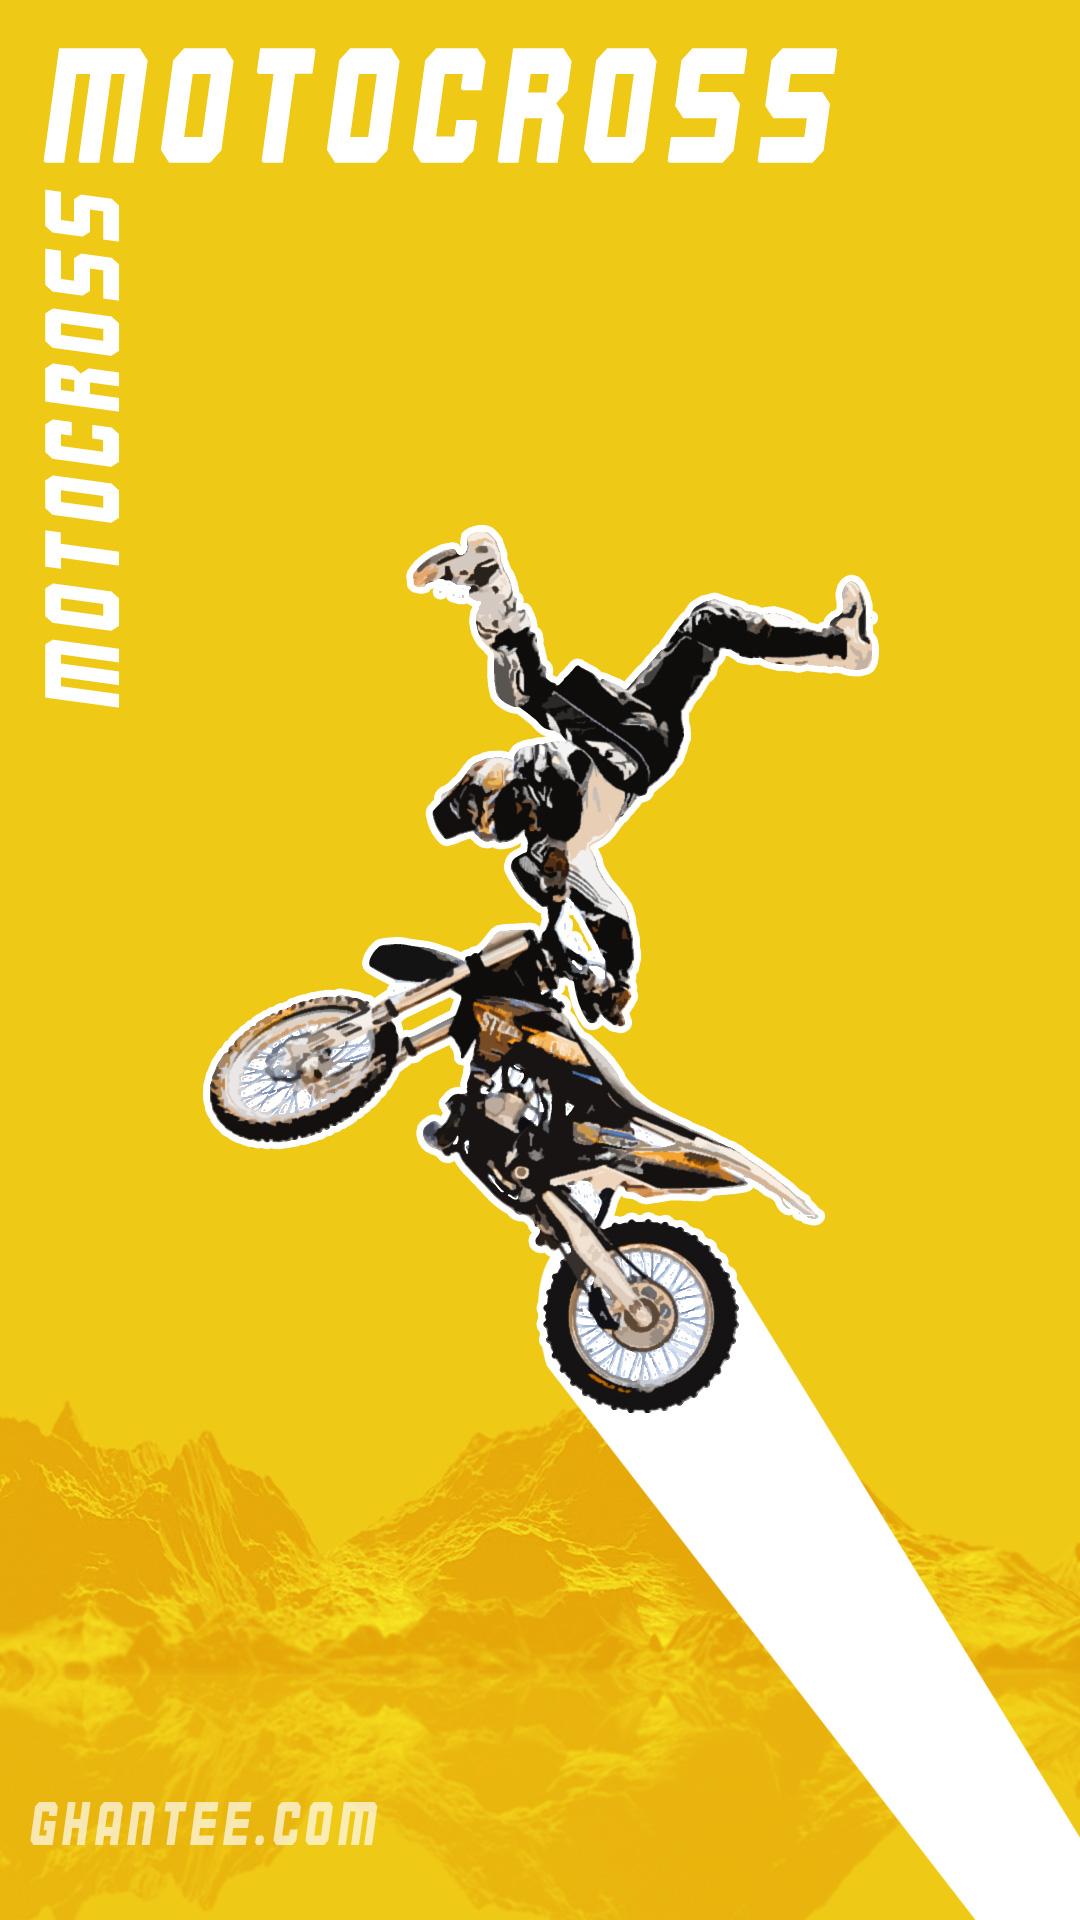 motocross madness hd phone wallpaper